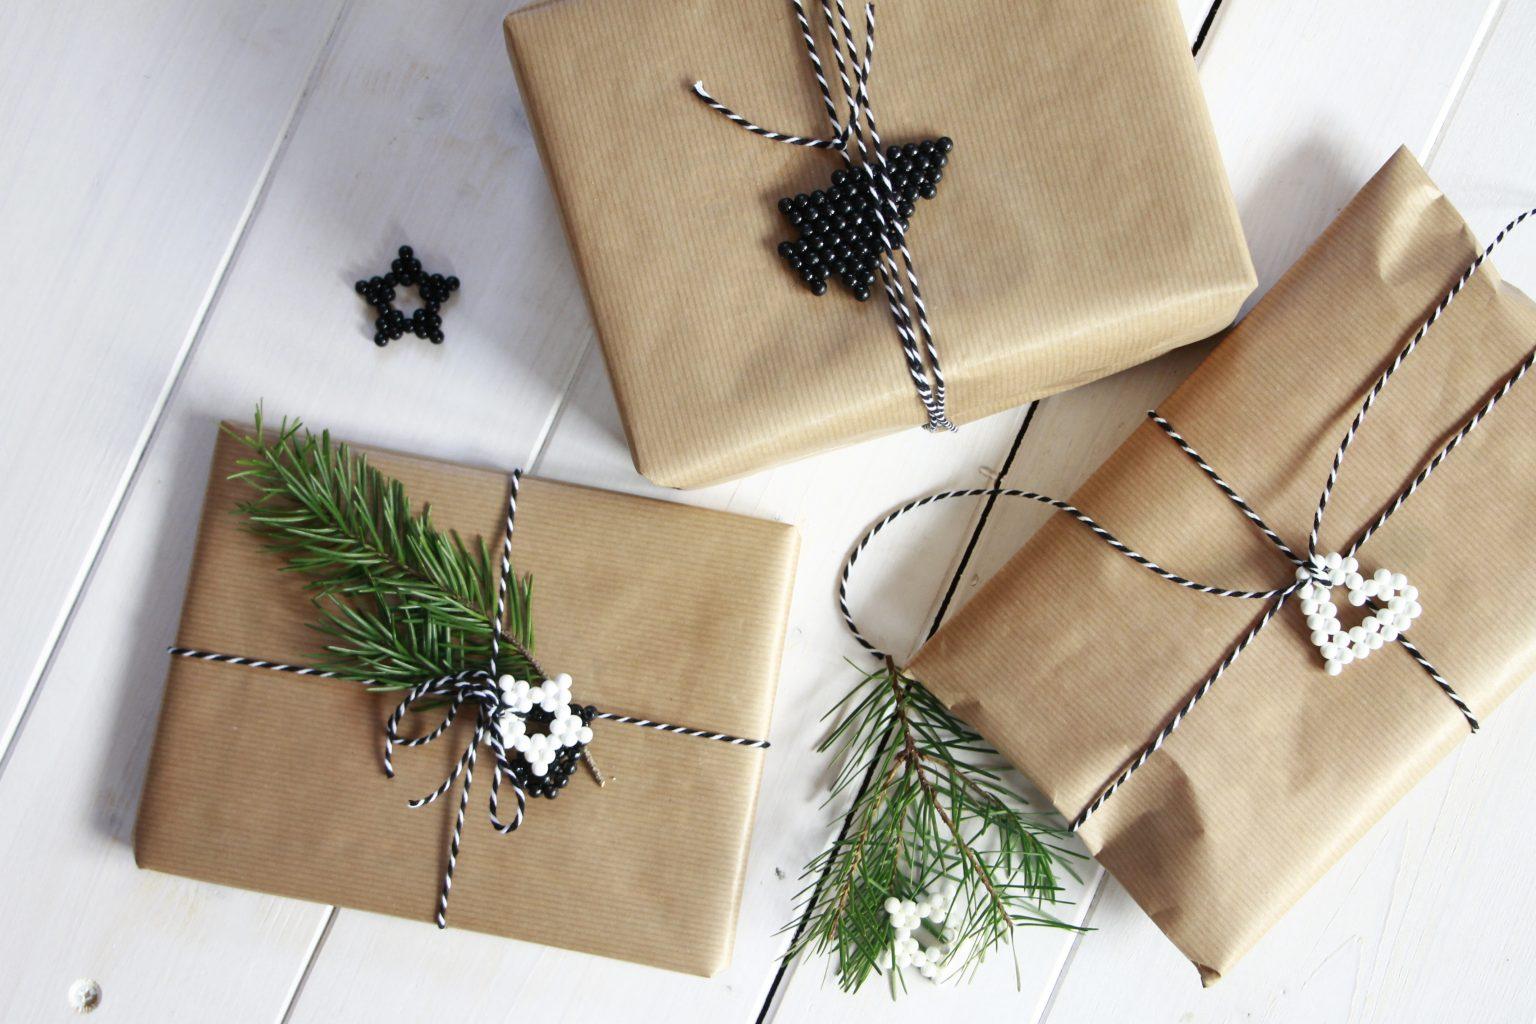 Weihnachtsgeschenke verpacken Packpapier